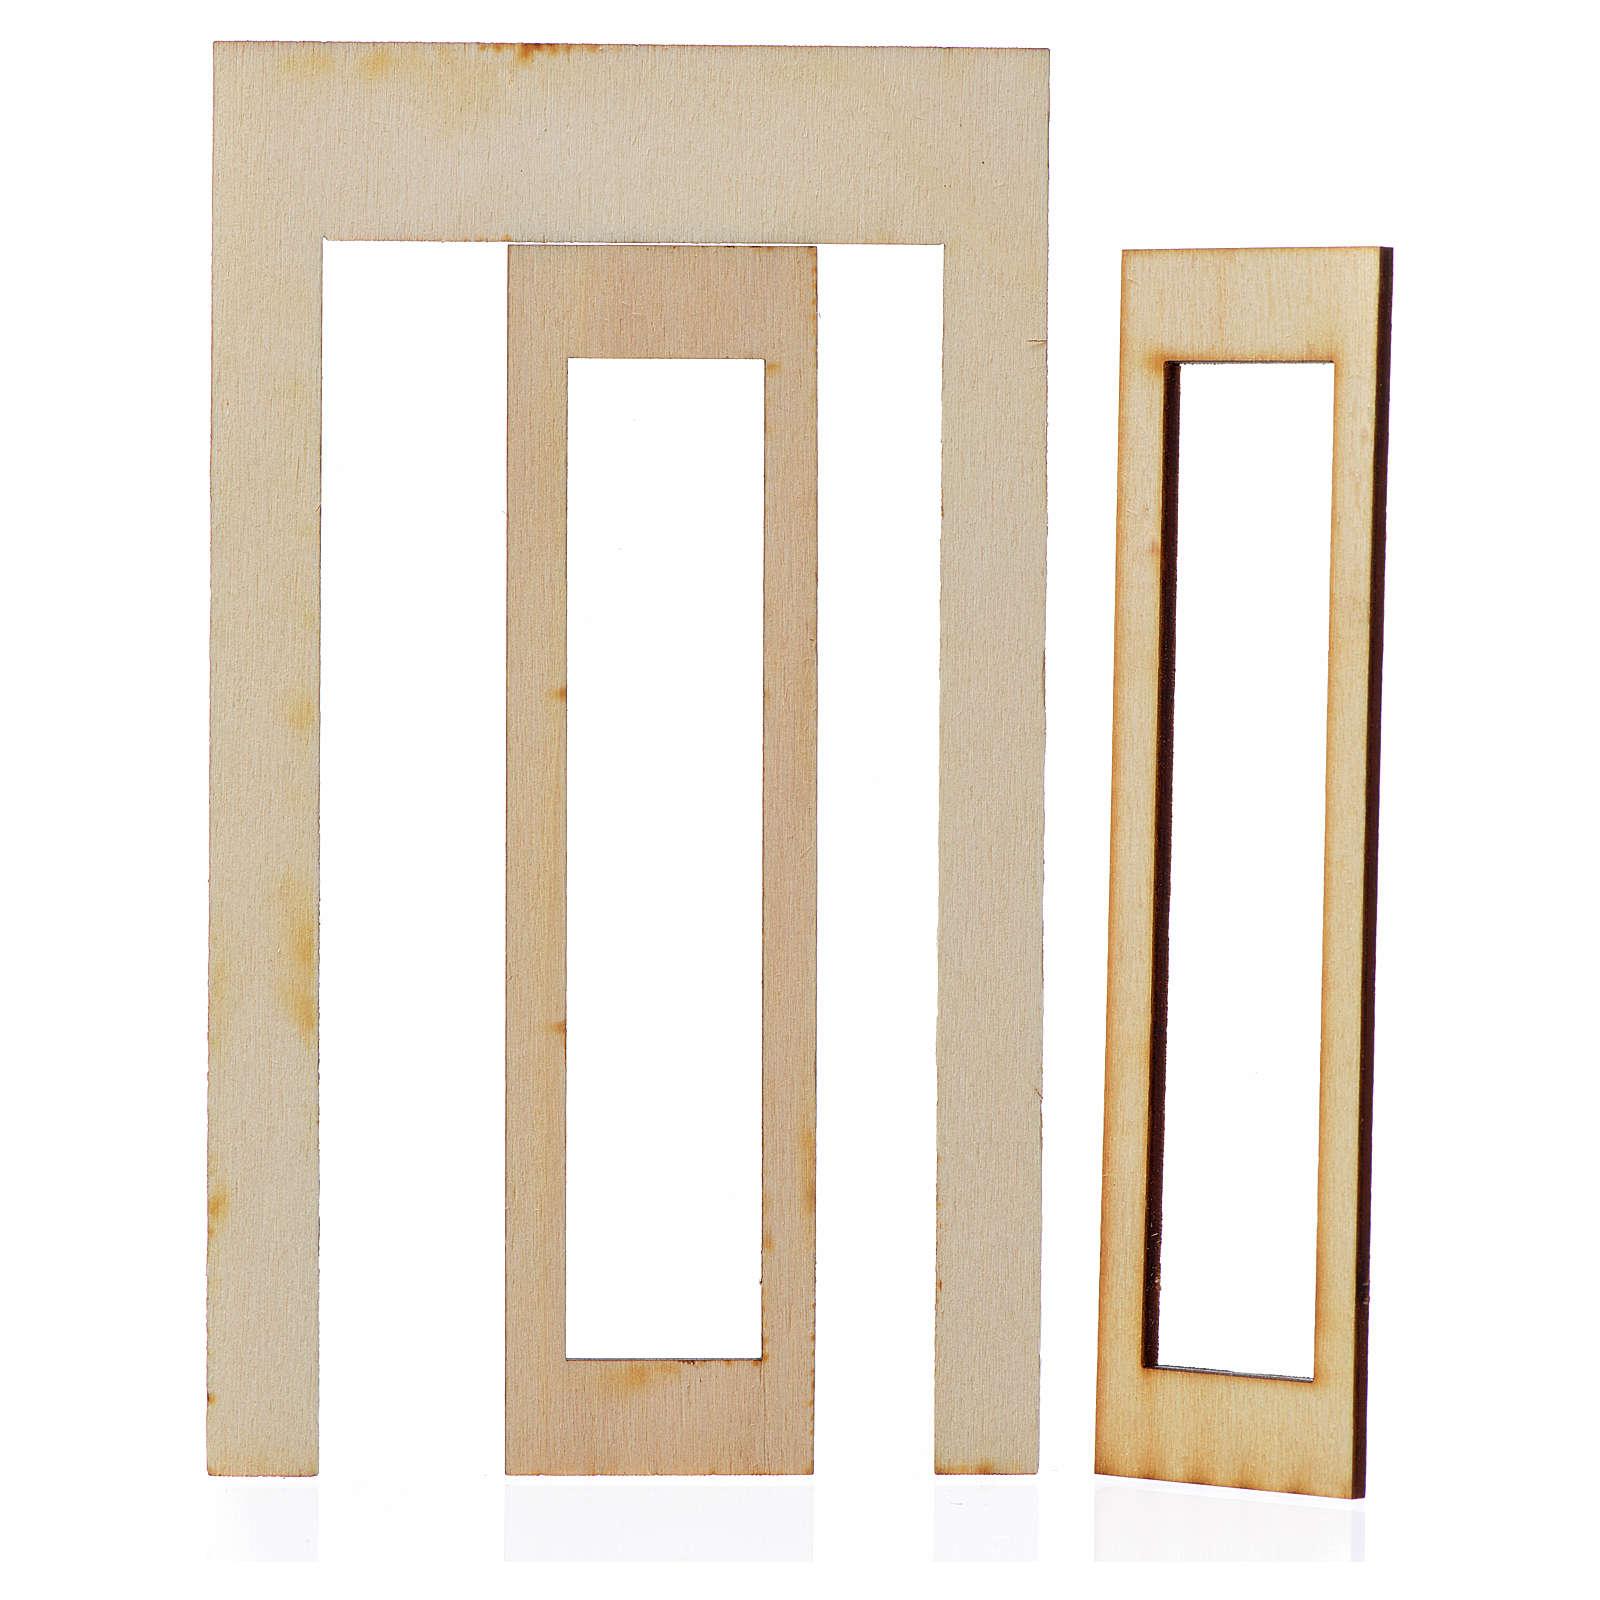 Nativity accessory, wooden frame 15x9cm 4